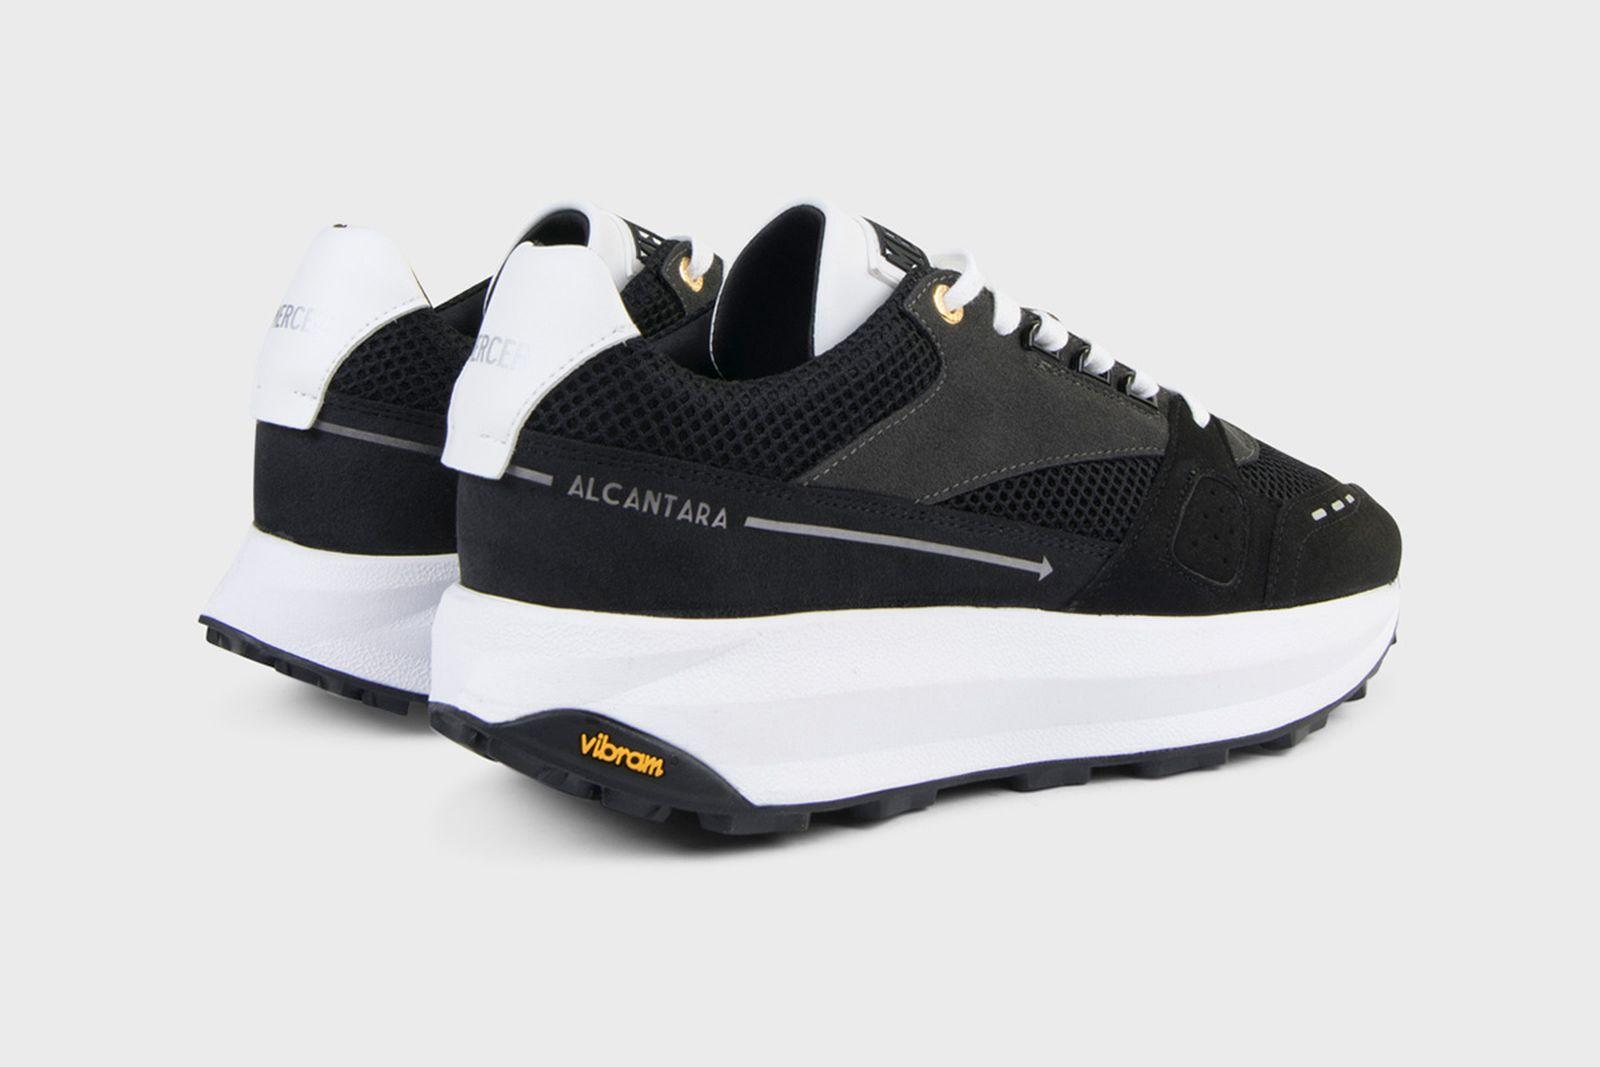 mercer-alcantara-sneaker-release-date-price-06